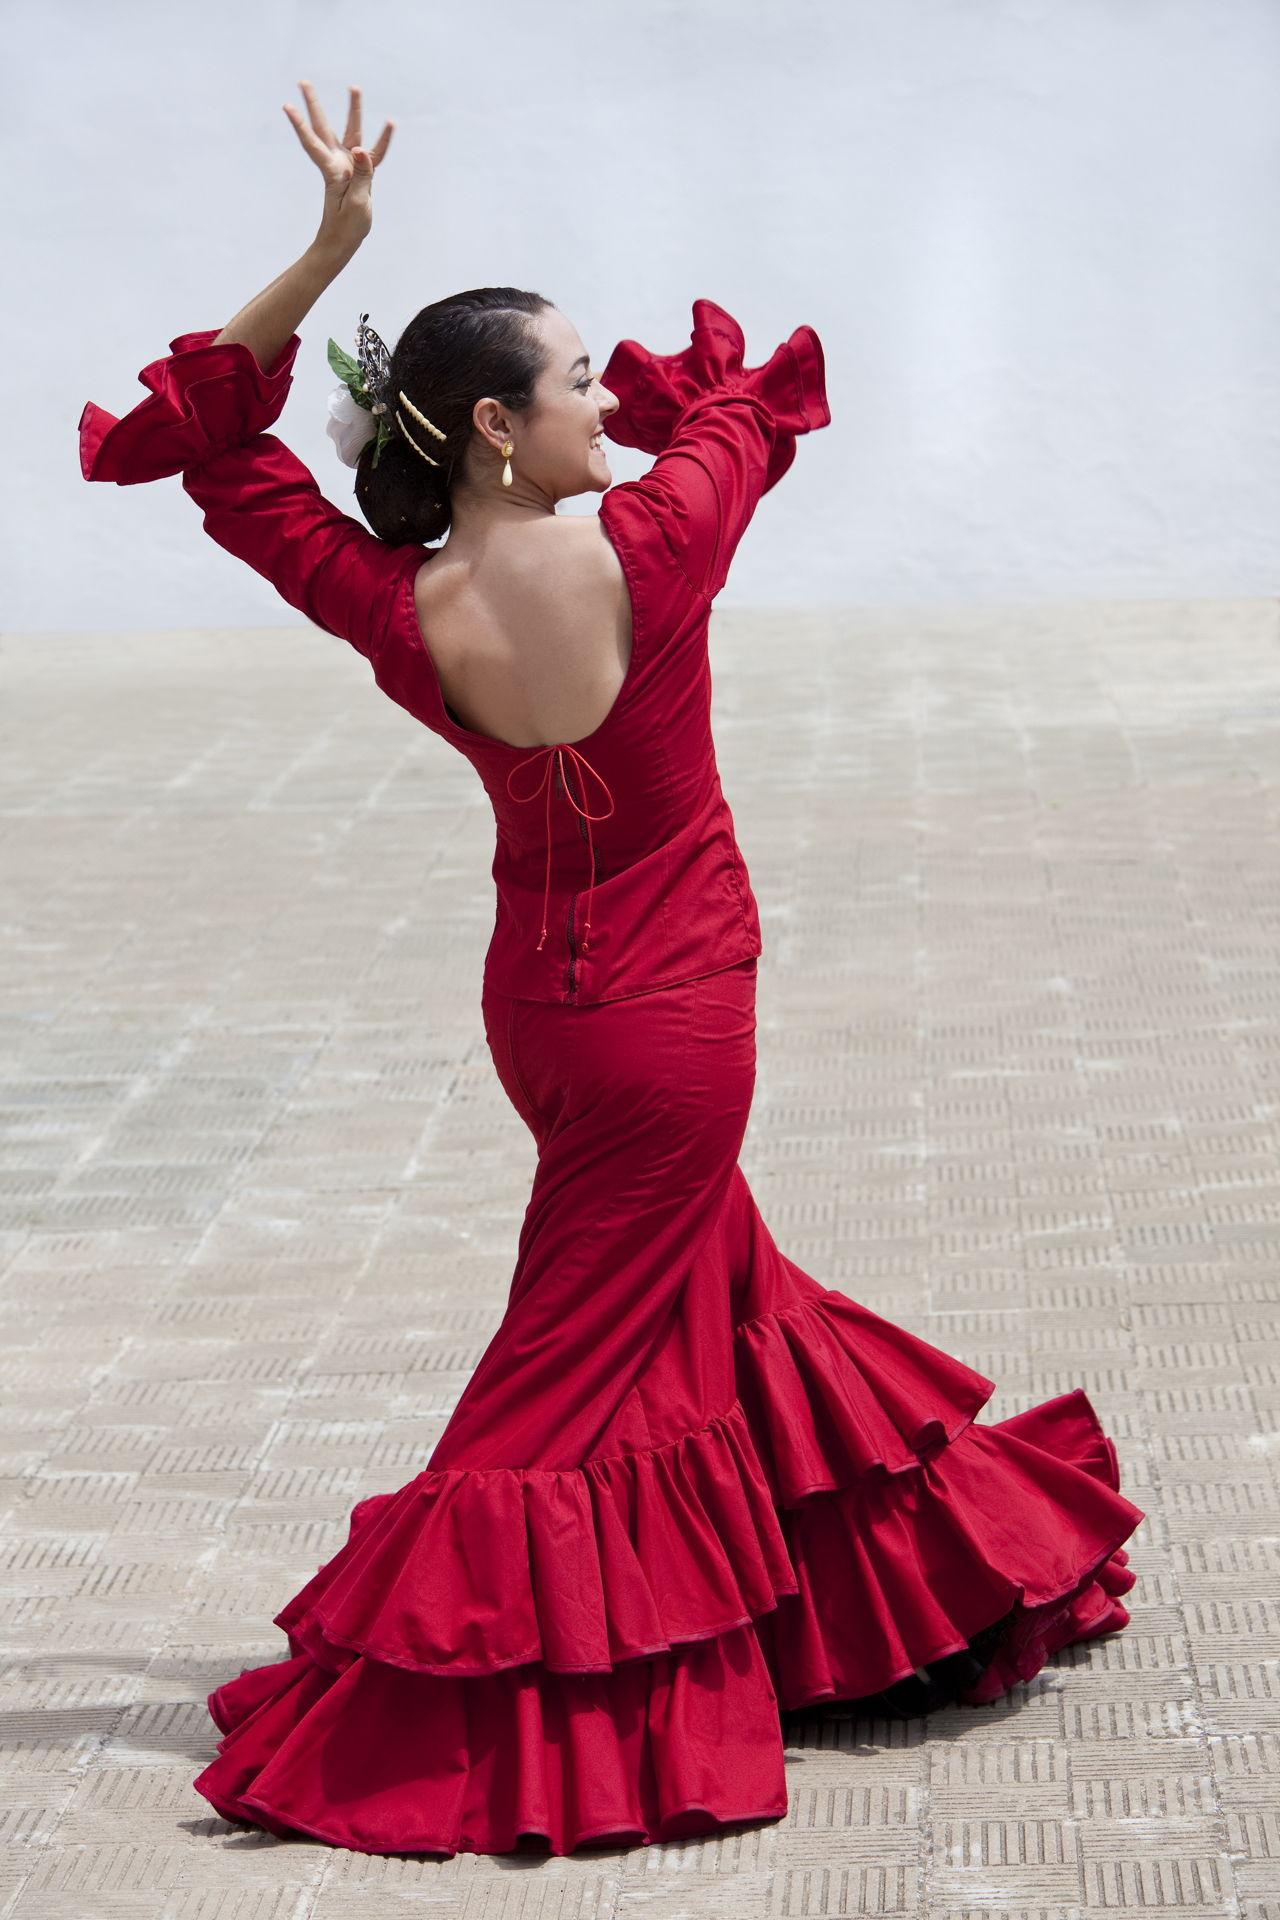 Spanish Flamenco Dancer In Red Dress on Tango Steps For Beginners